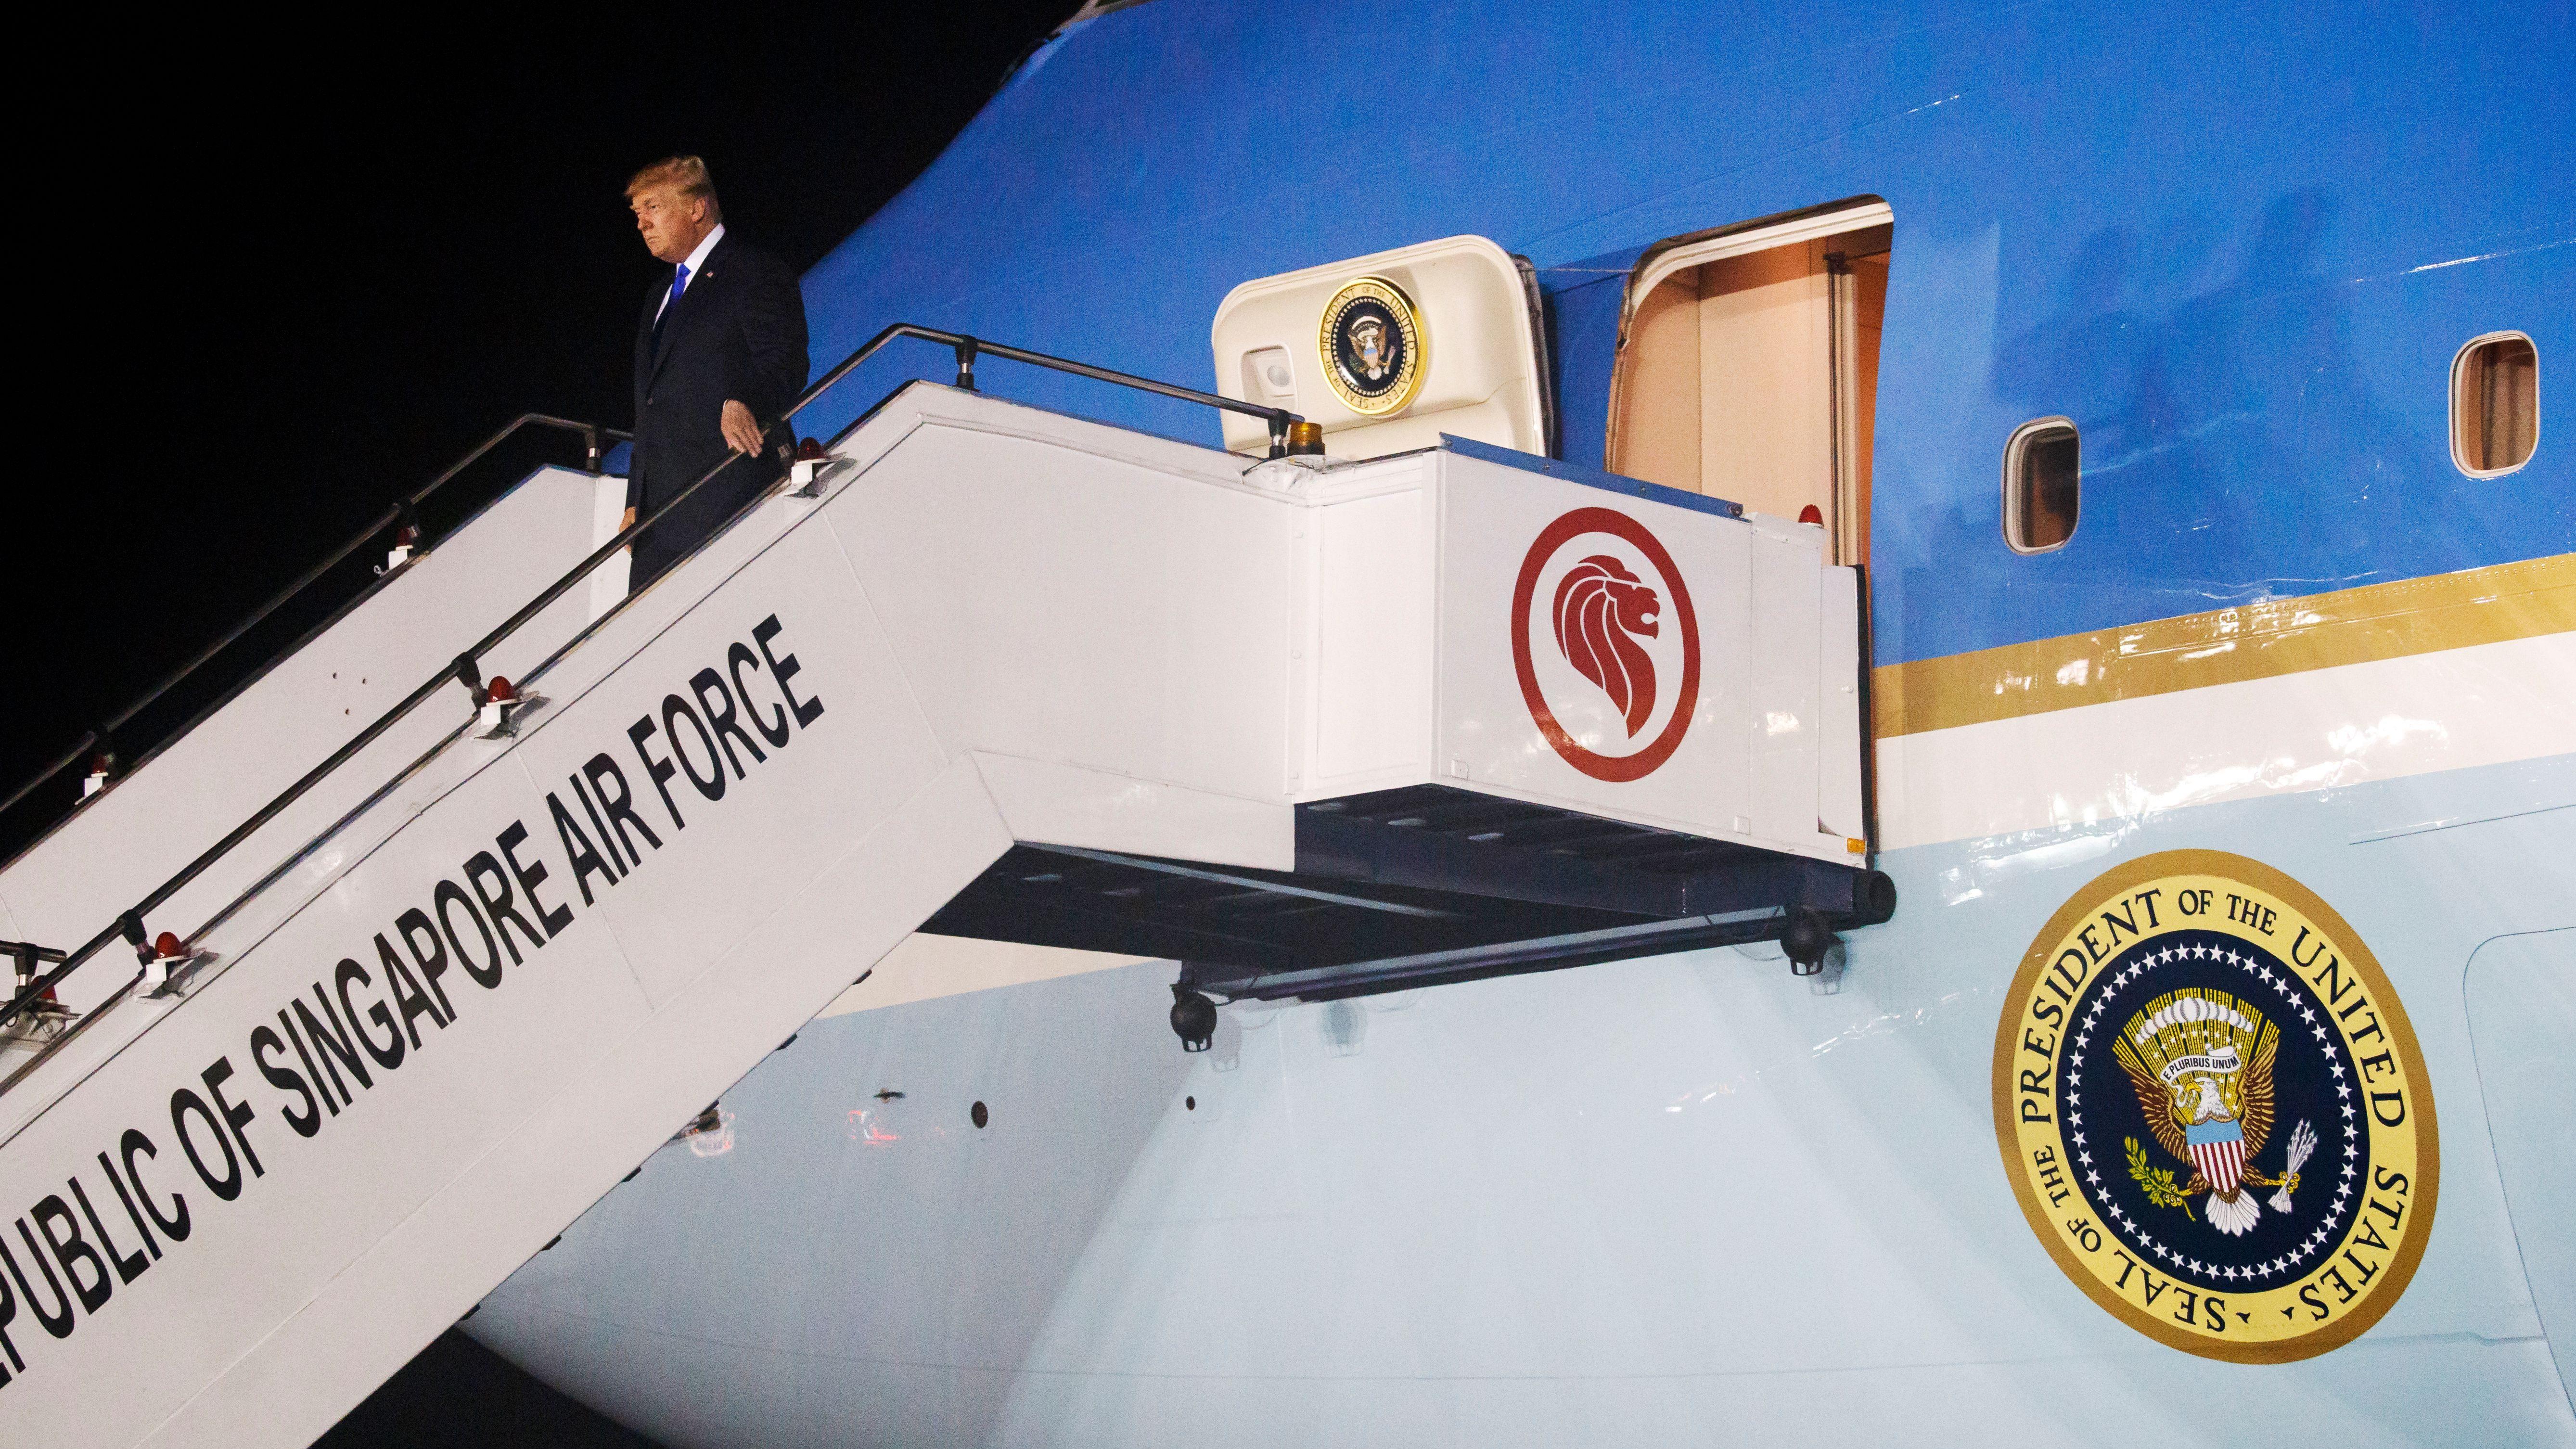 President Donald Trump arrives at Paya Lebar Air Base for a summit with North Korean leader Kim Jong Un, Sunday, June 10, 2018, in Singapore.